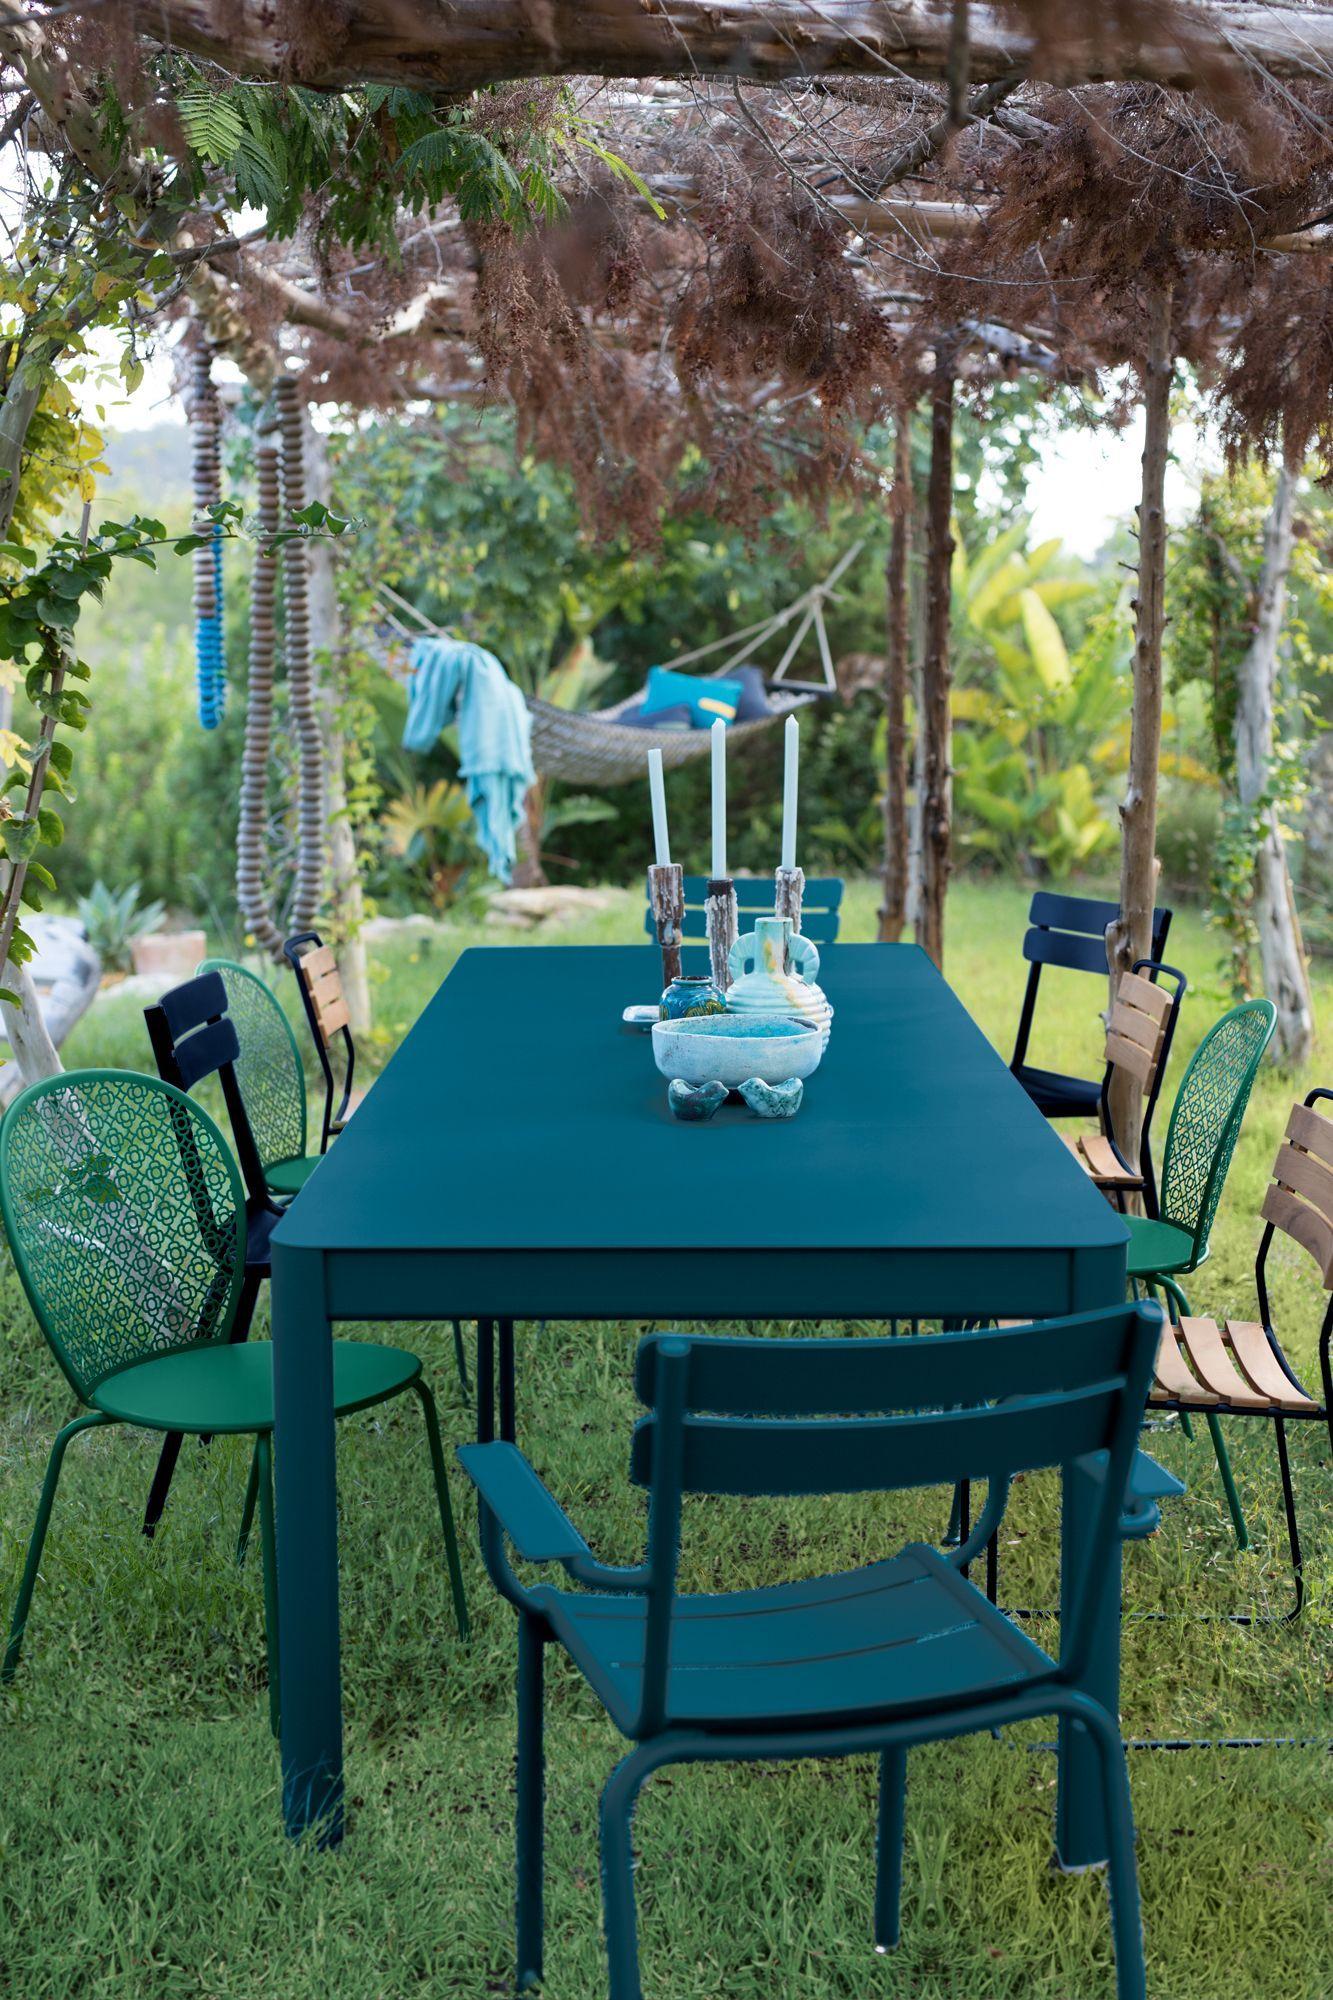 Table De Jardin A Rallonges 24 Couleurs Disponibles Ausziehbarer Gartentisch Gartentisch Garten